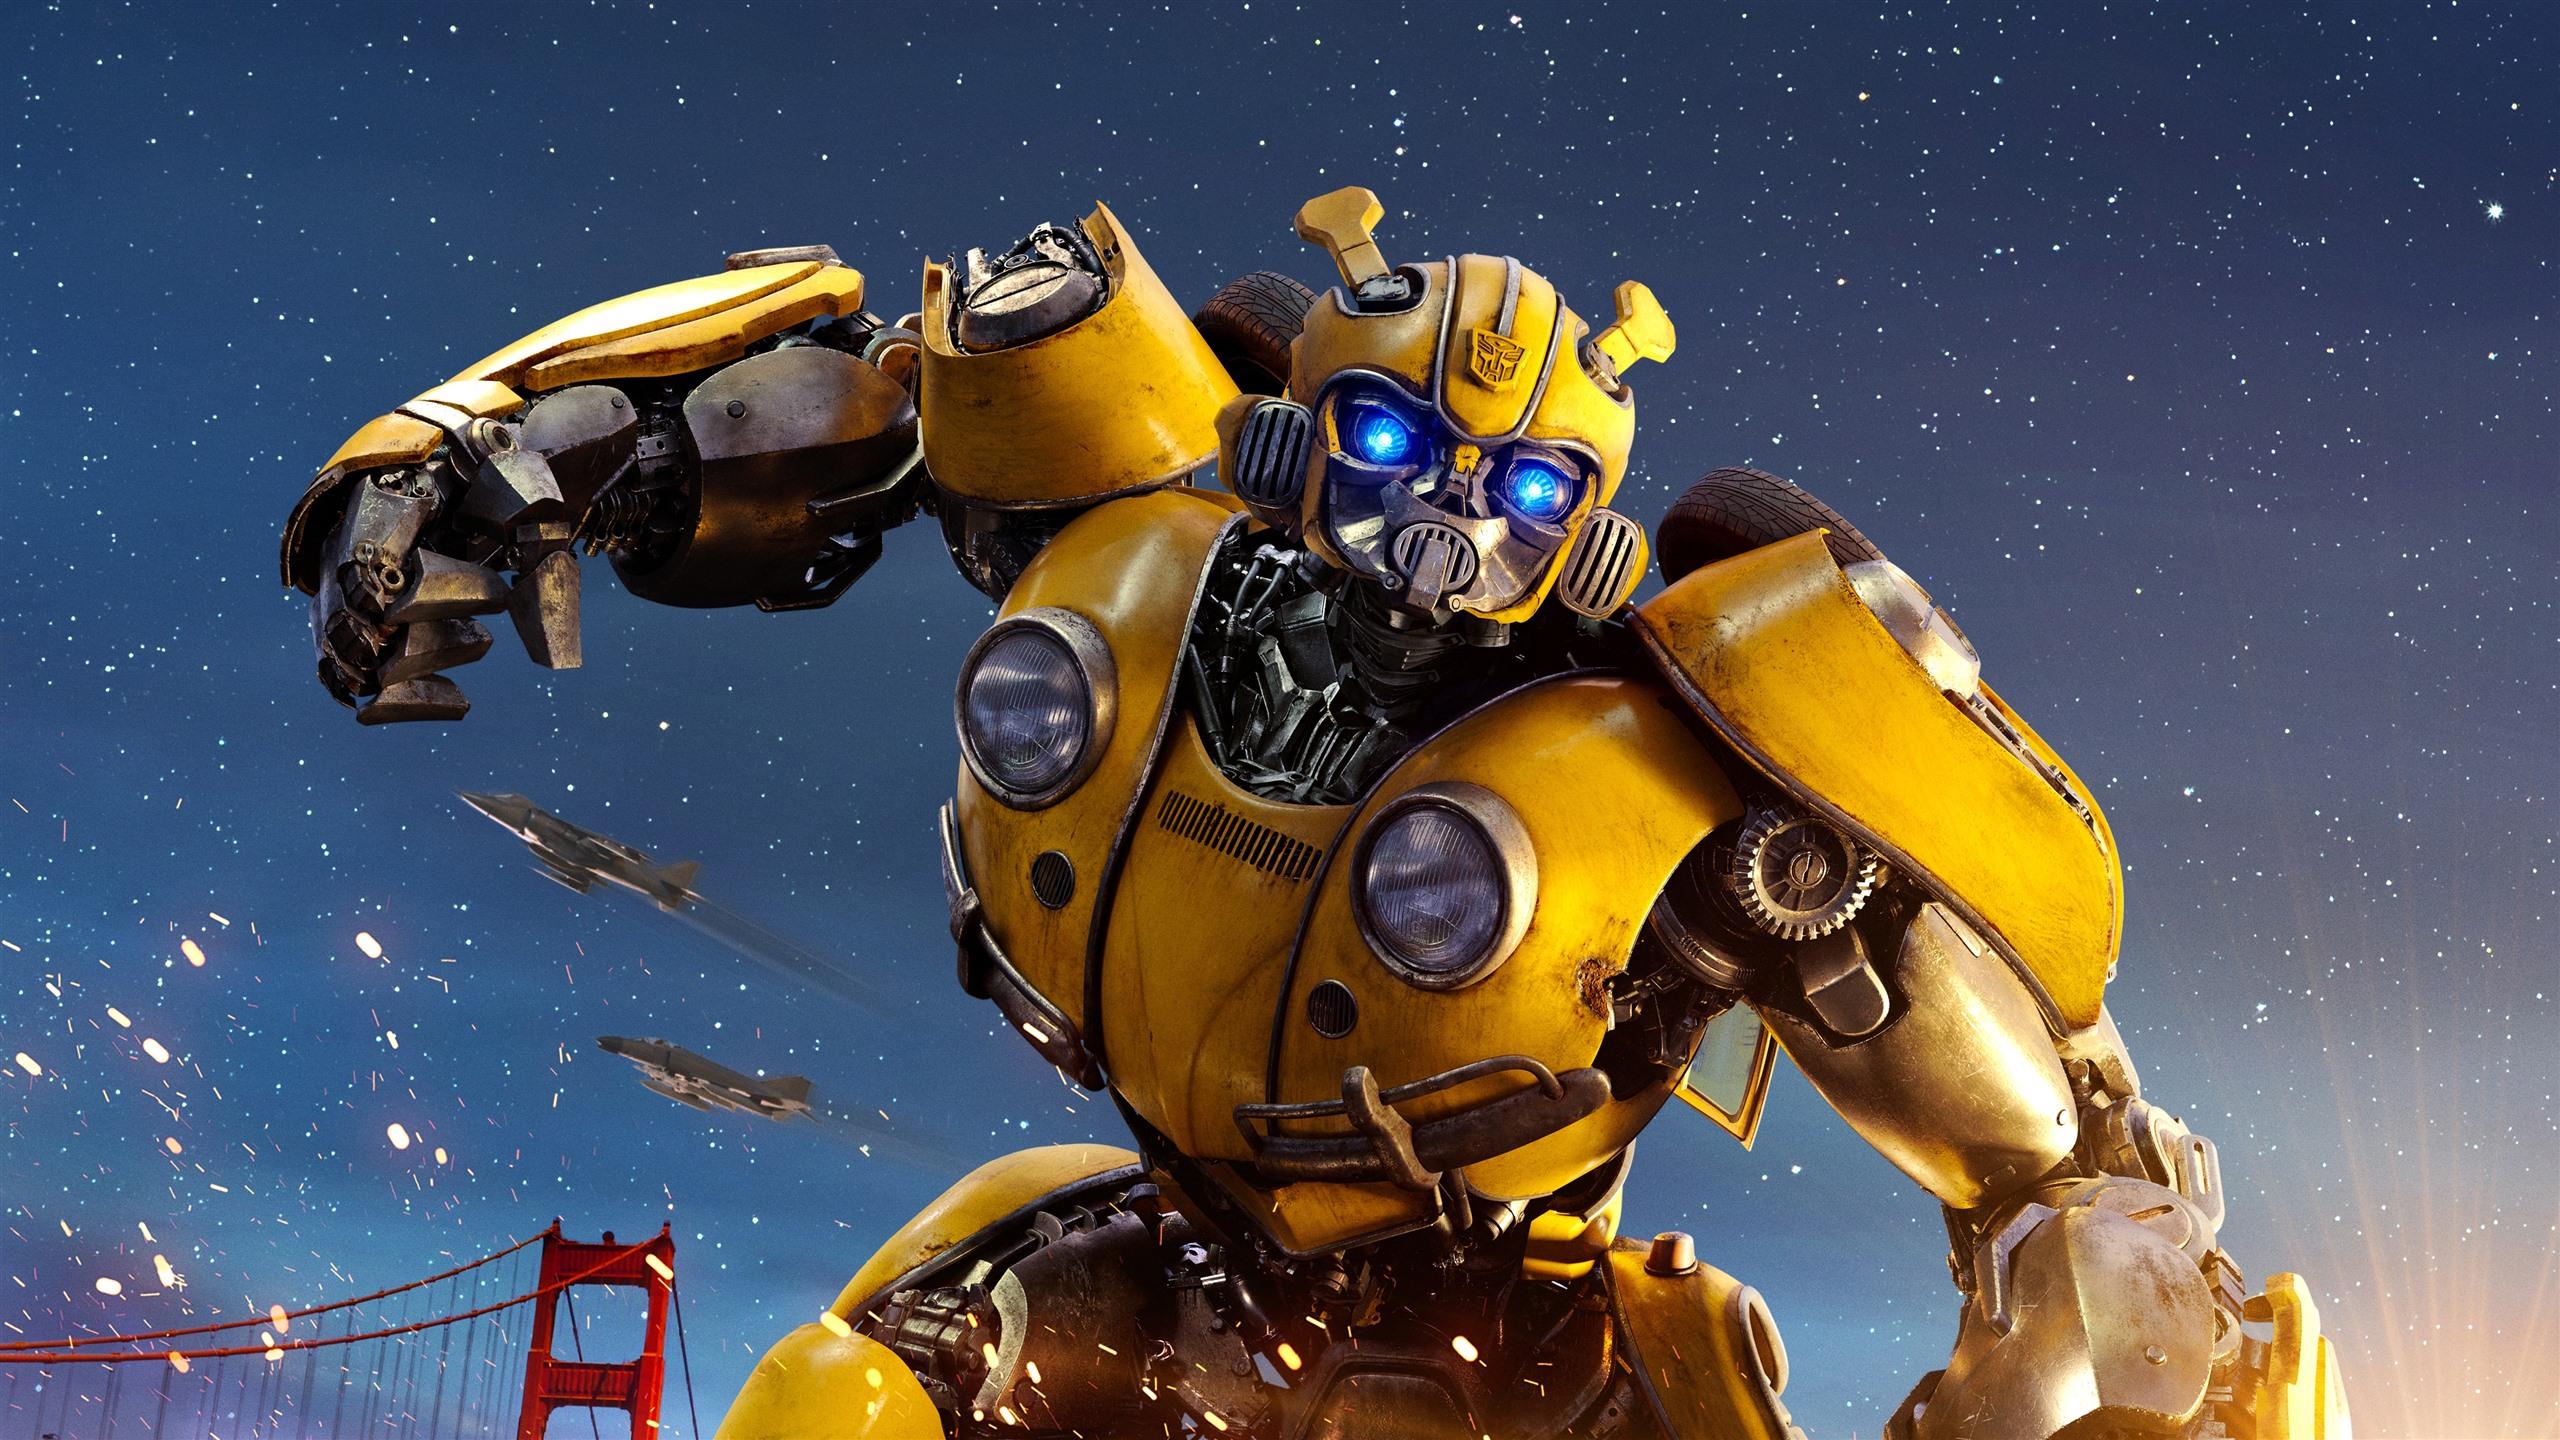 Transformers Bumblebee Robot 1242x2688 Iphone Xs Max